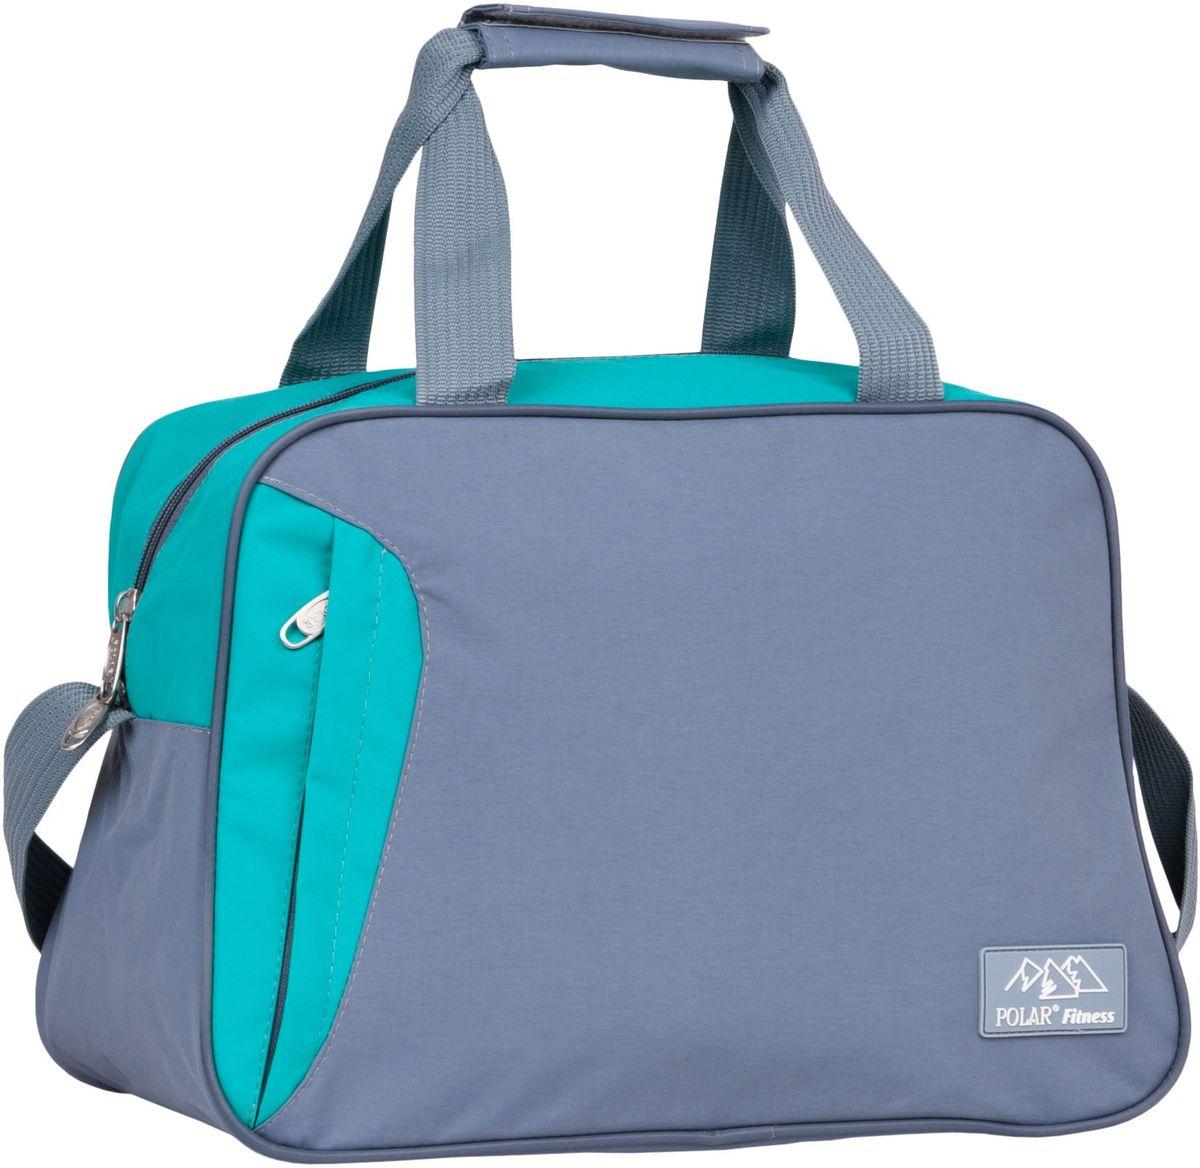 Сумка спортивная Polar, цвет: серый, бирюзовый, 30 л. П7071 рюкзак polar polar po001buawne5